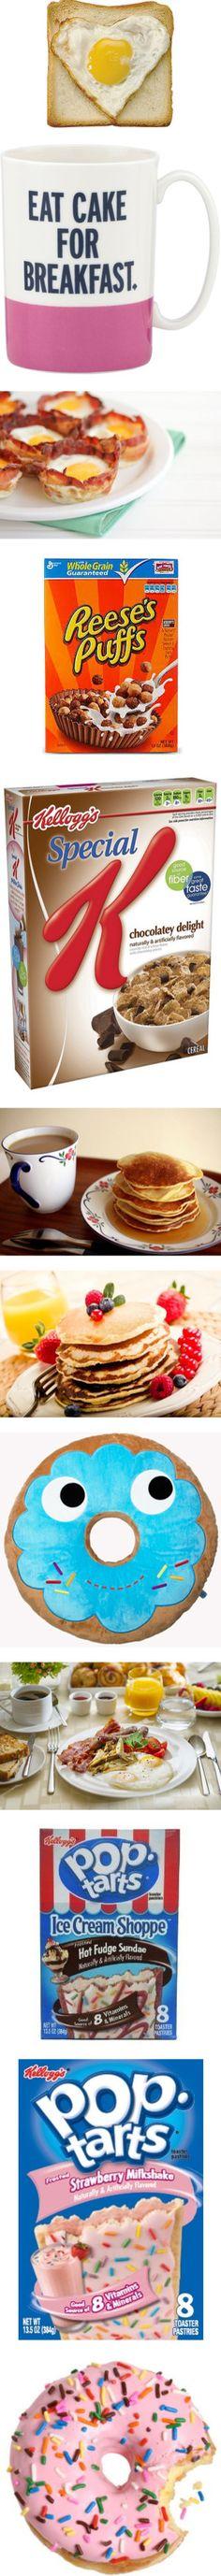 """breakfast"" by beautyandthetardis ❤ liked on Polyvore"